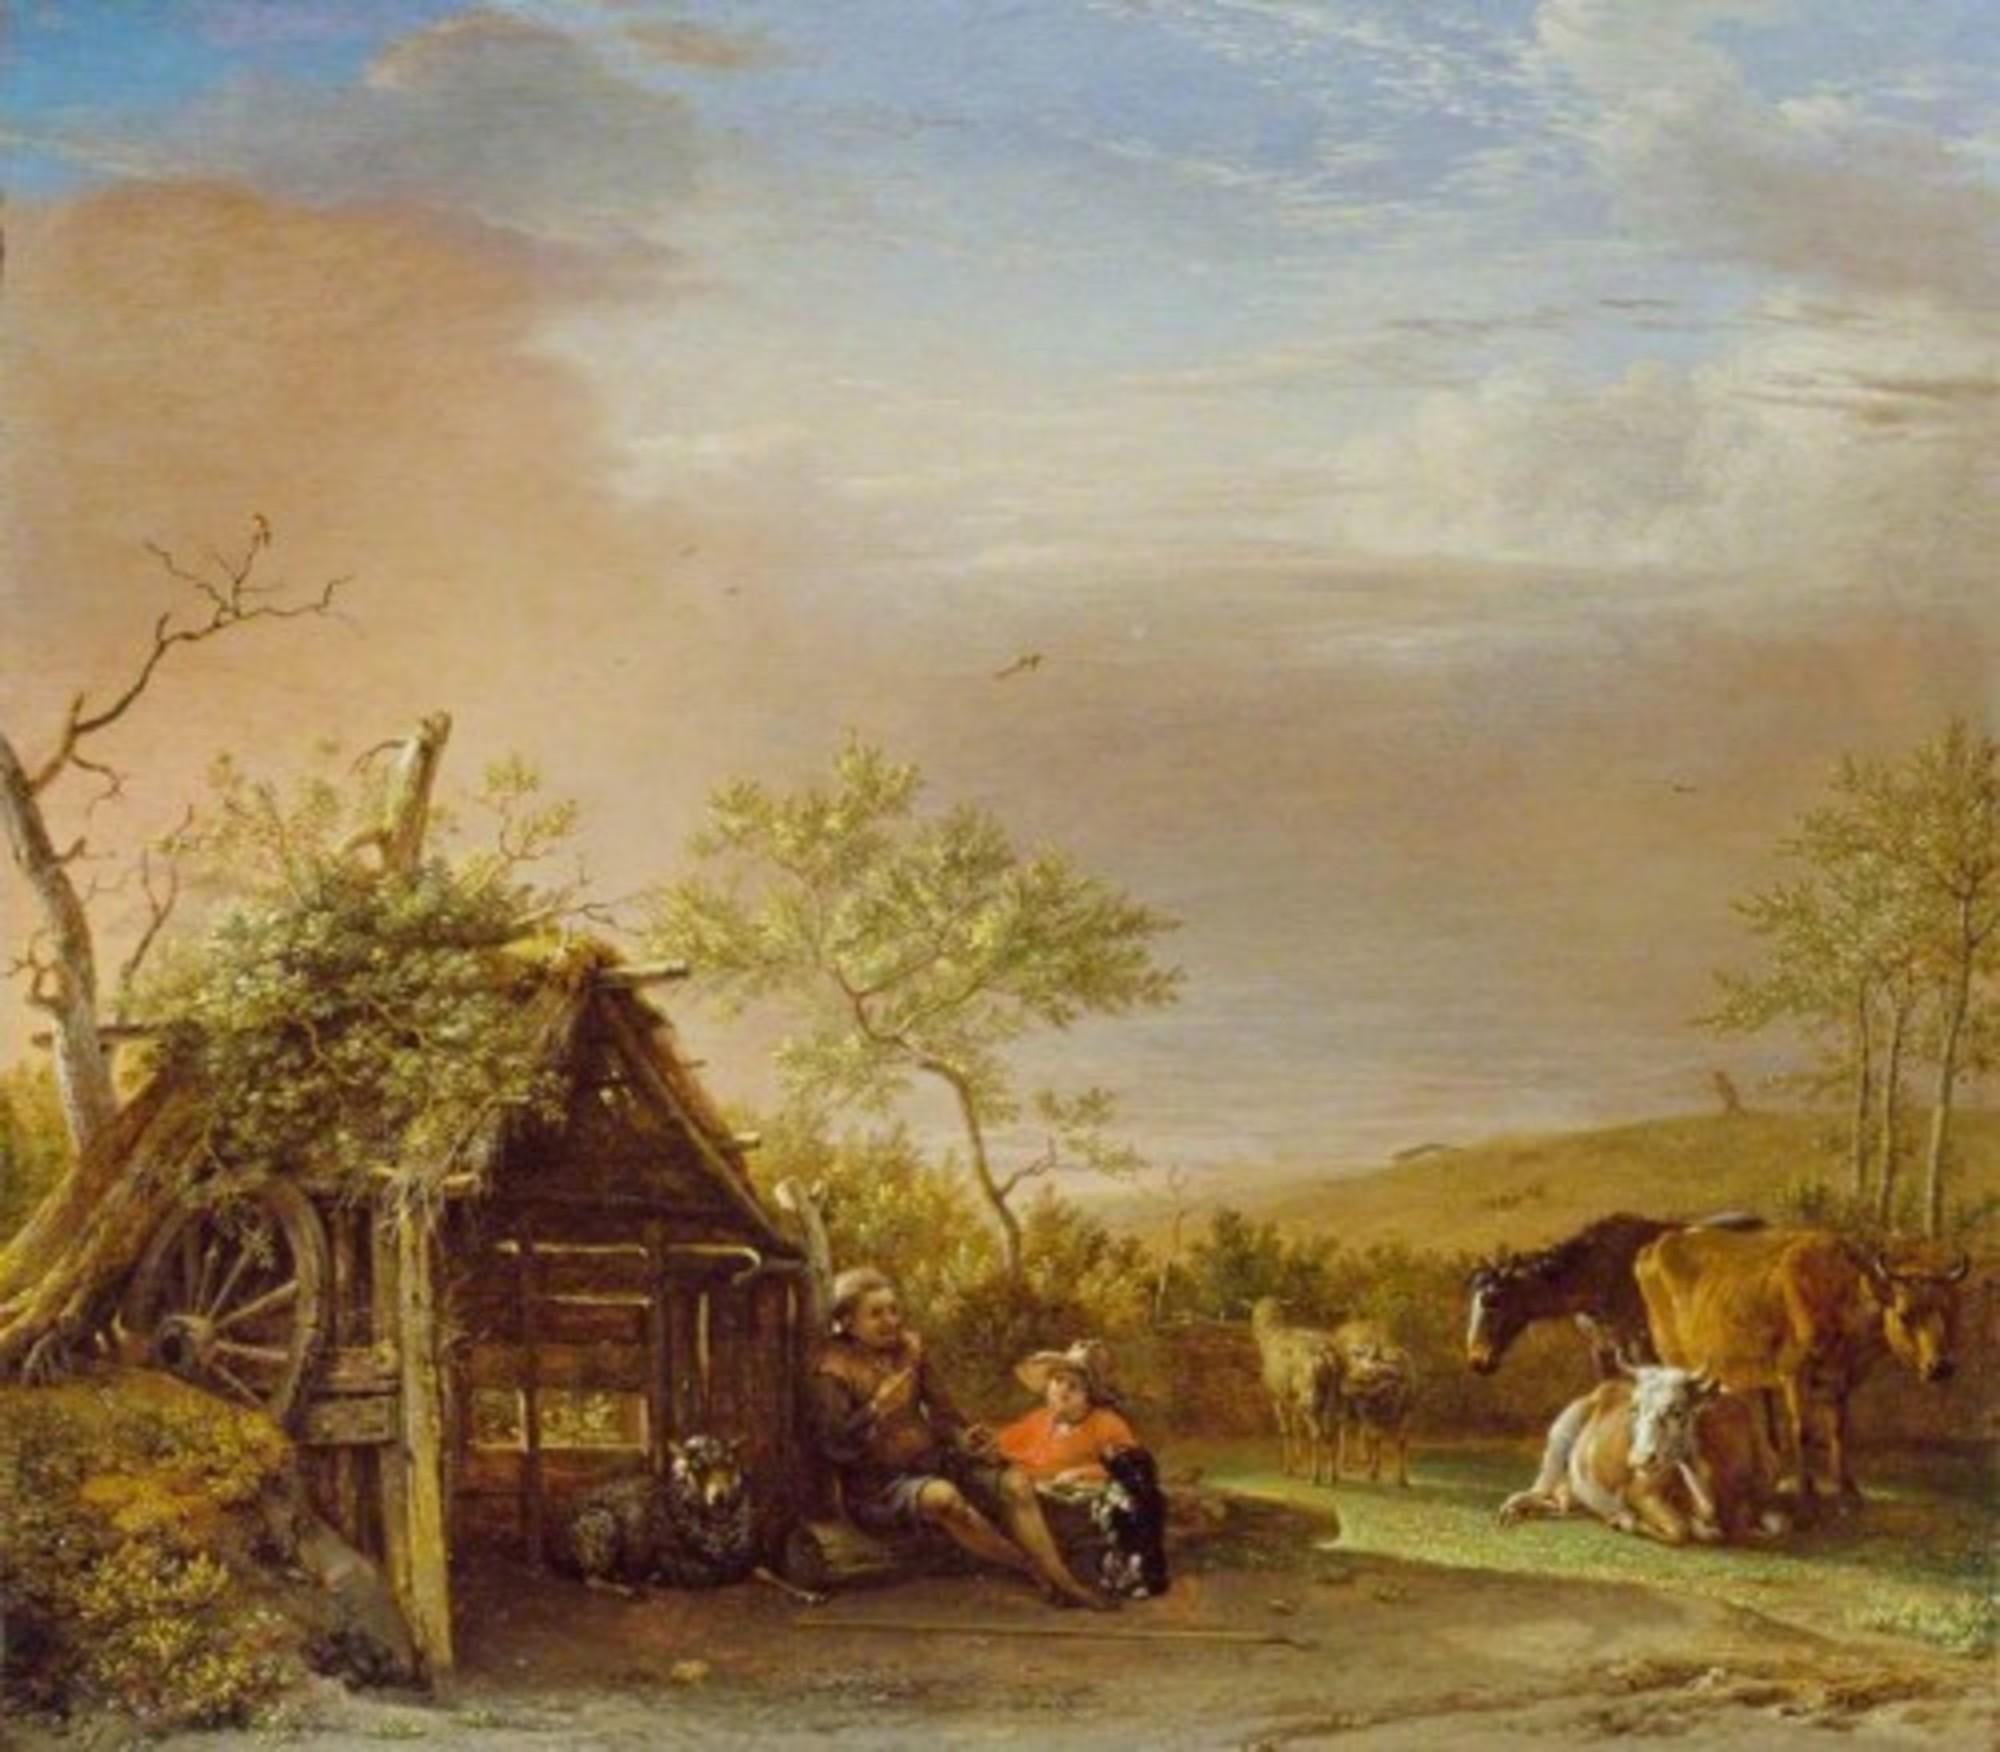 Paulus-Potter---Herdsmen-with-Their-Cattle-WLC-WLC-P189.jpg